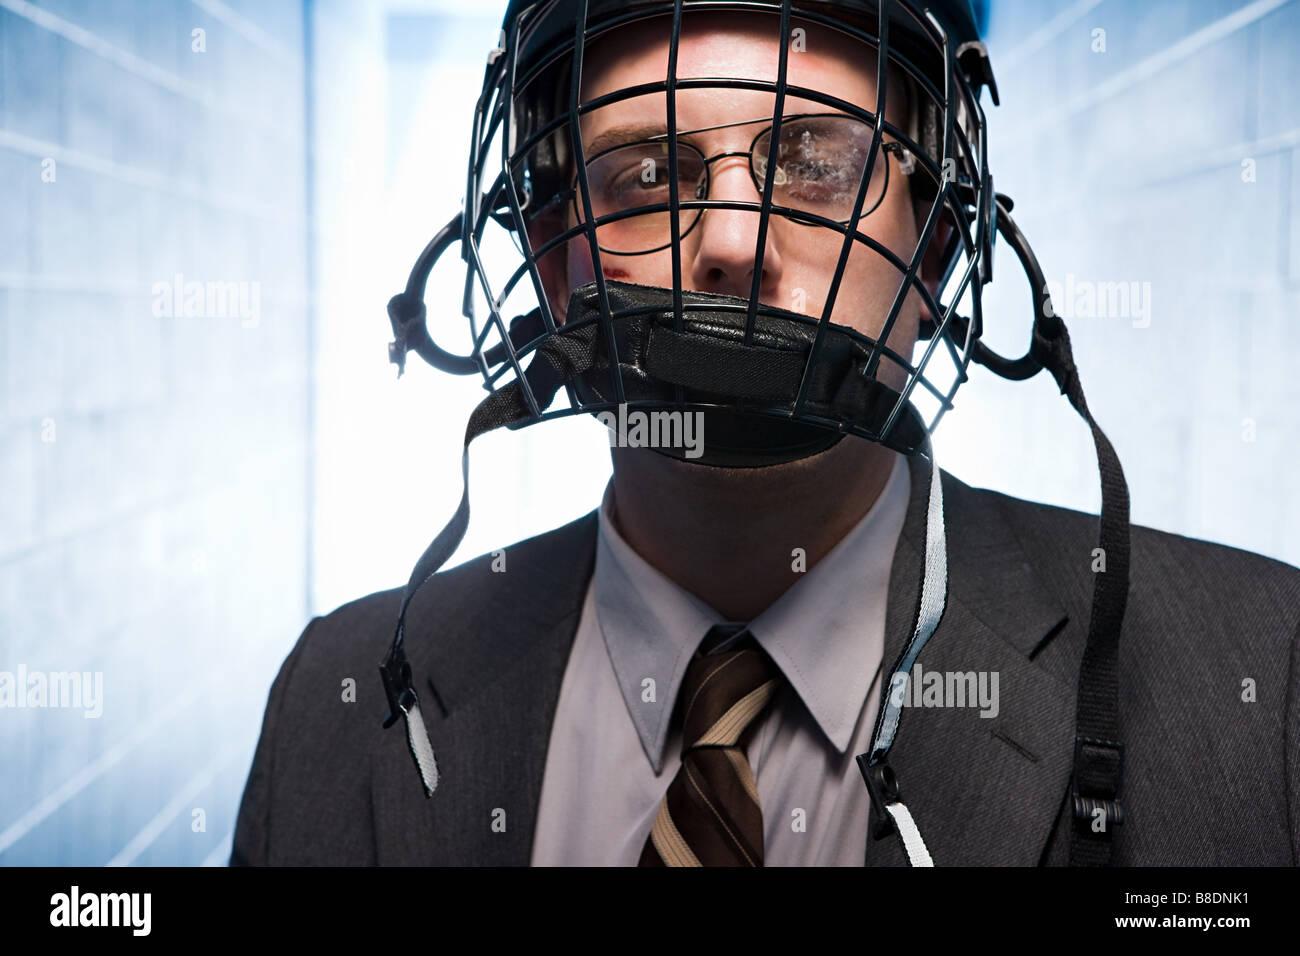 Injured businessman wearing an ice hockey helmet Stock Photo